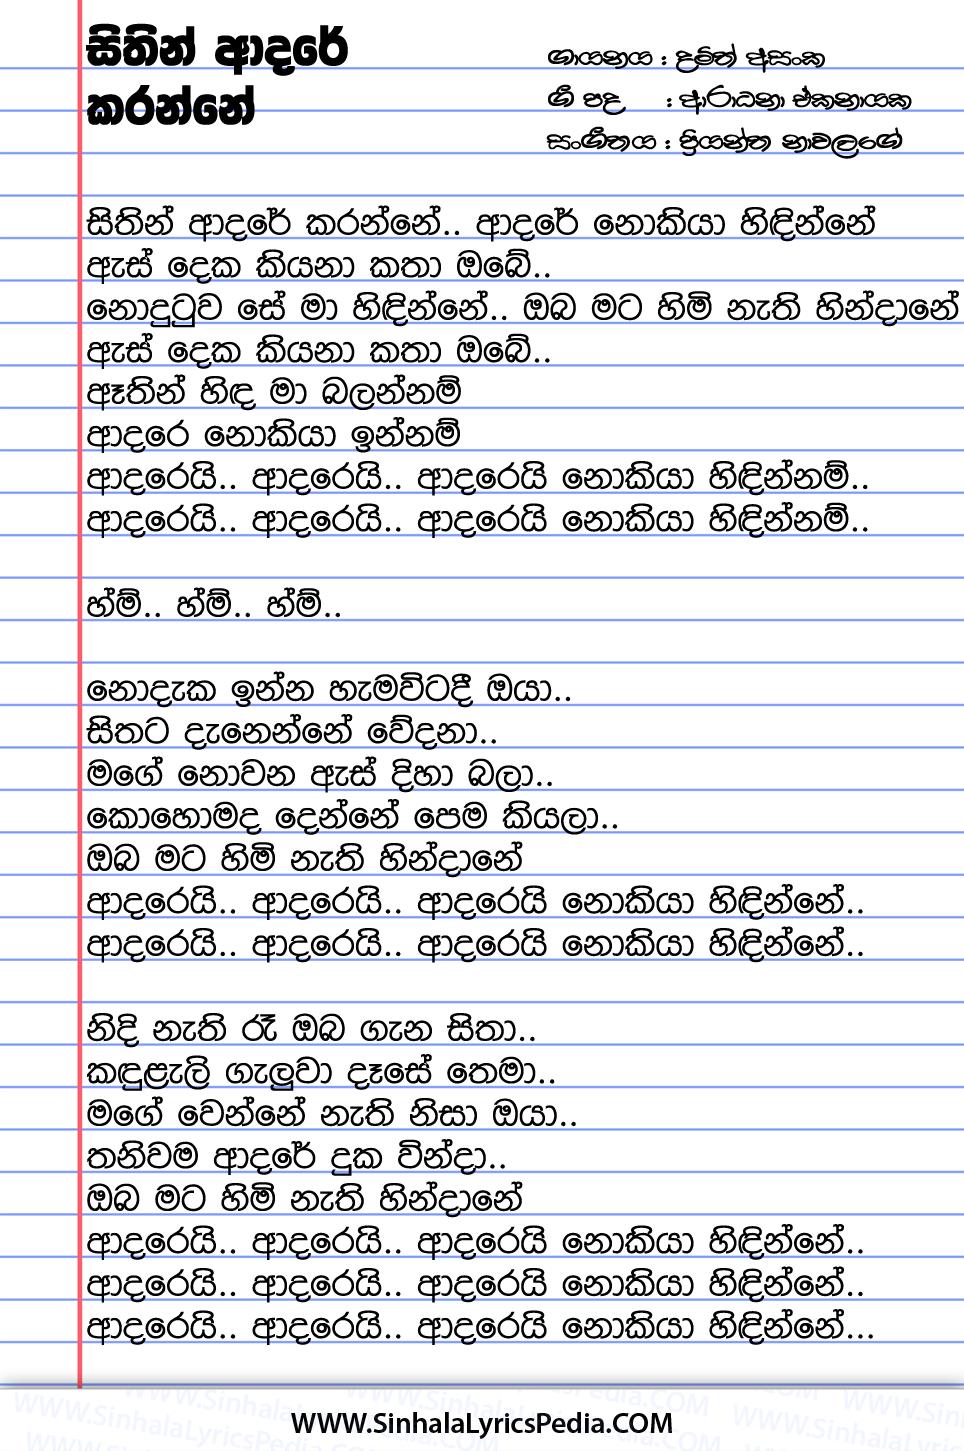 Sithin Adare Karanne Song Lyrics